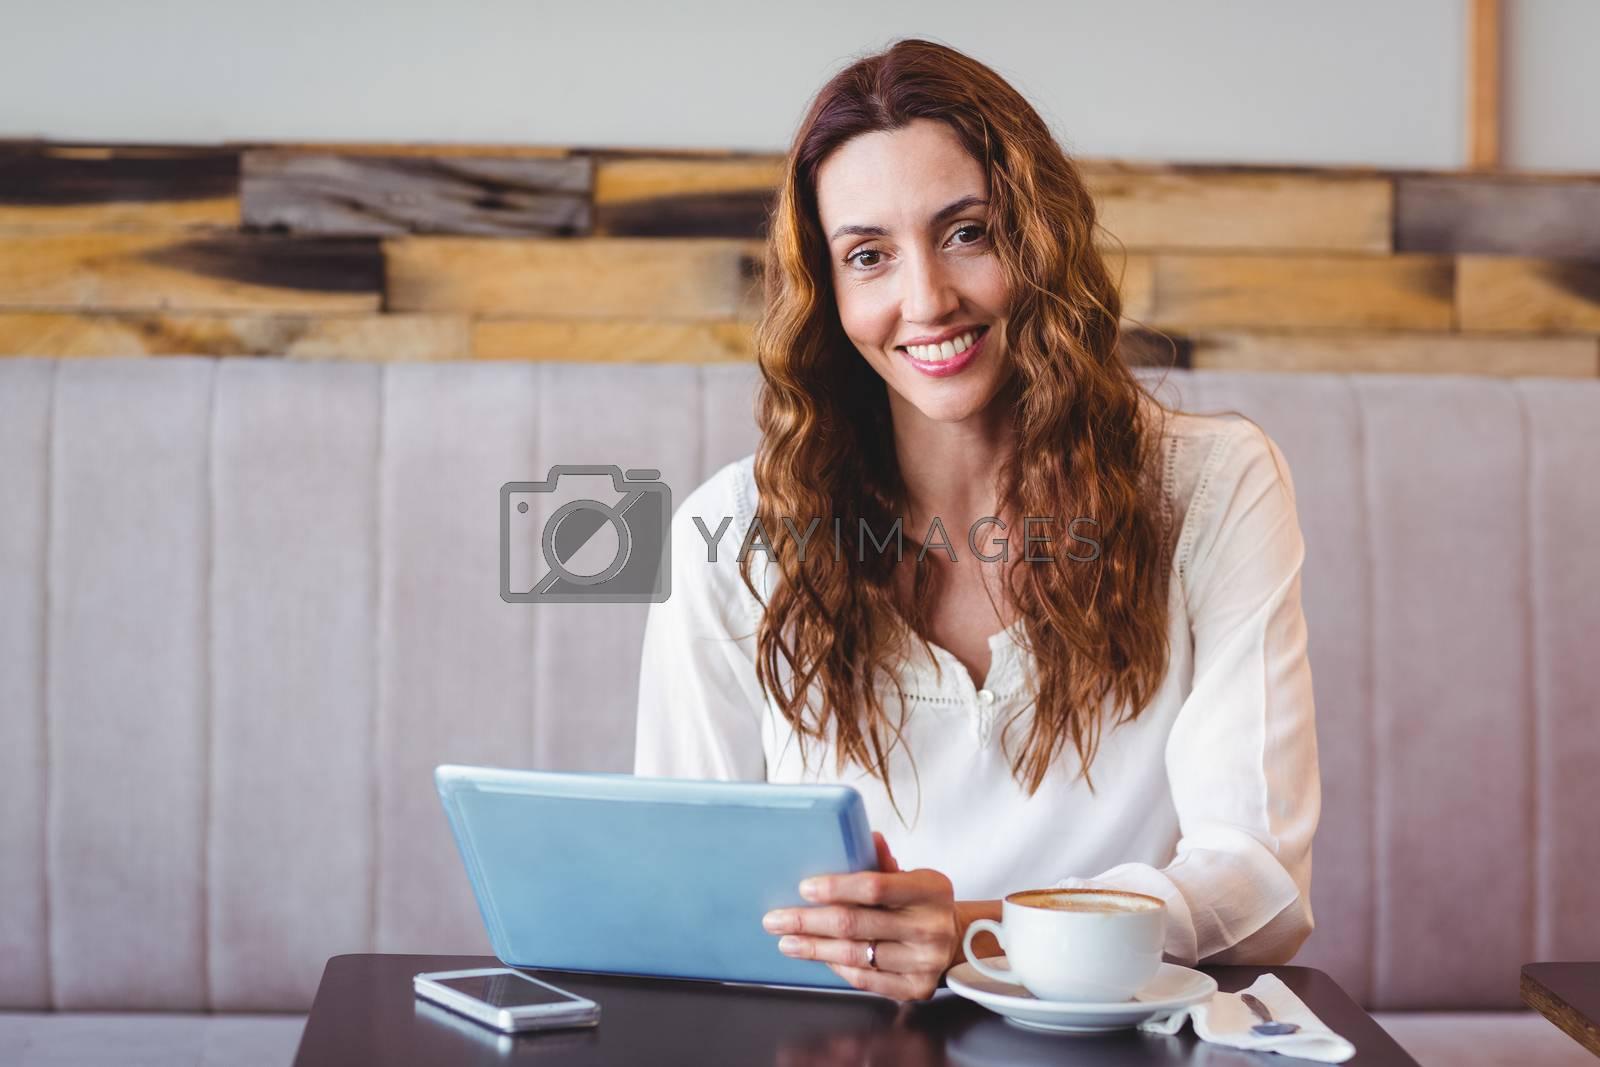 Royalty free image of Woman using digital tablet  by Wavebreakmedia